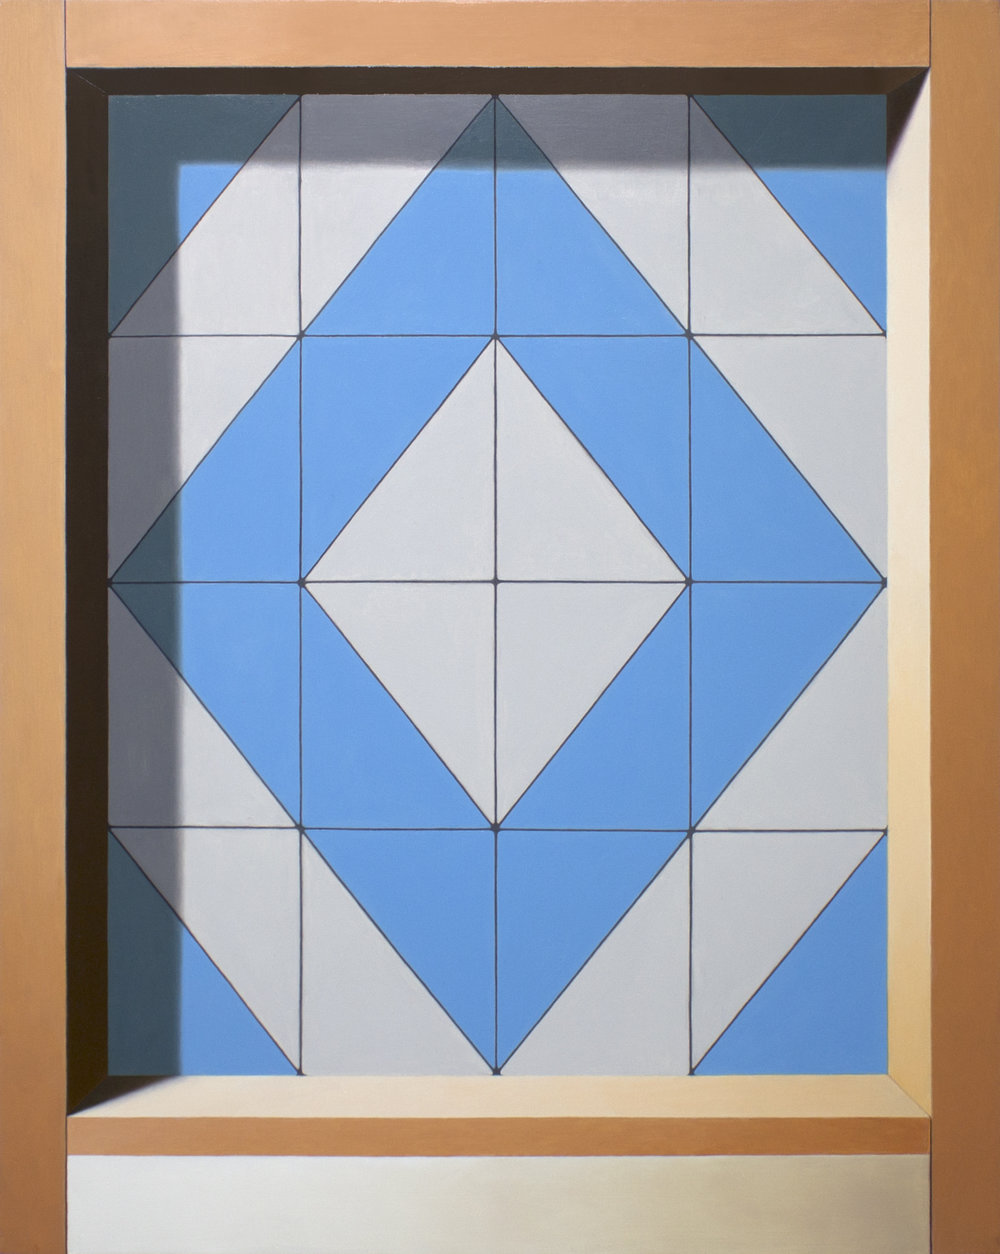 Threshold (Diamond)   2018  Oil on wood panel  20 x 16 in